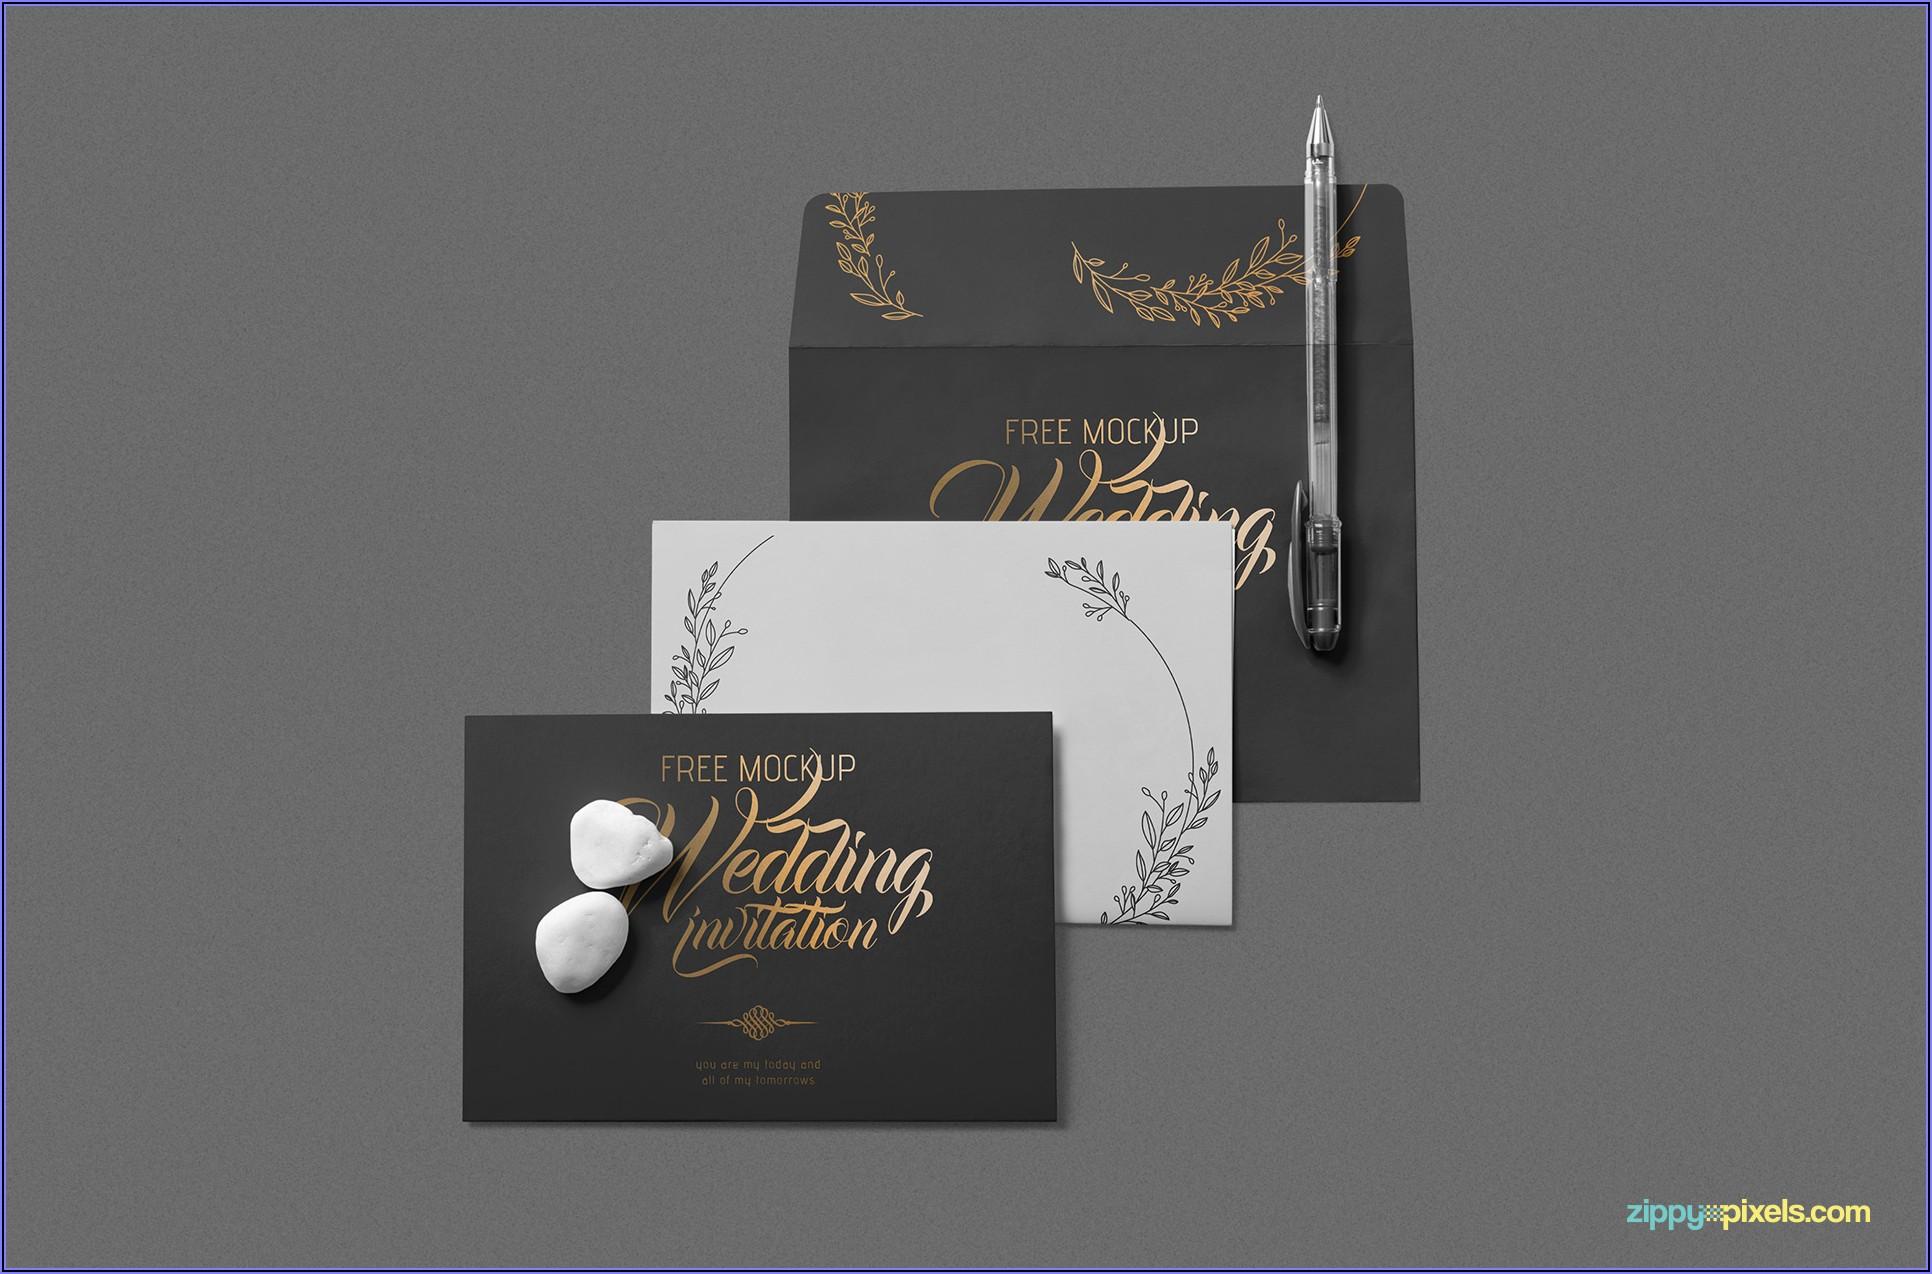 Wedding Invitation Mockup Free